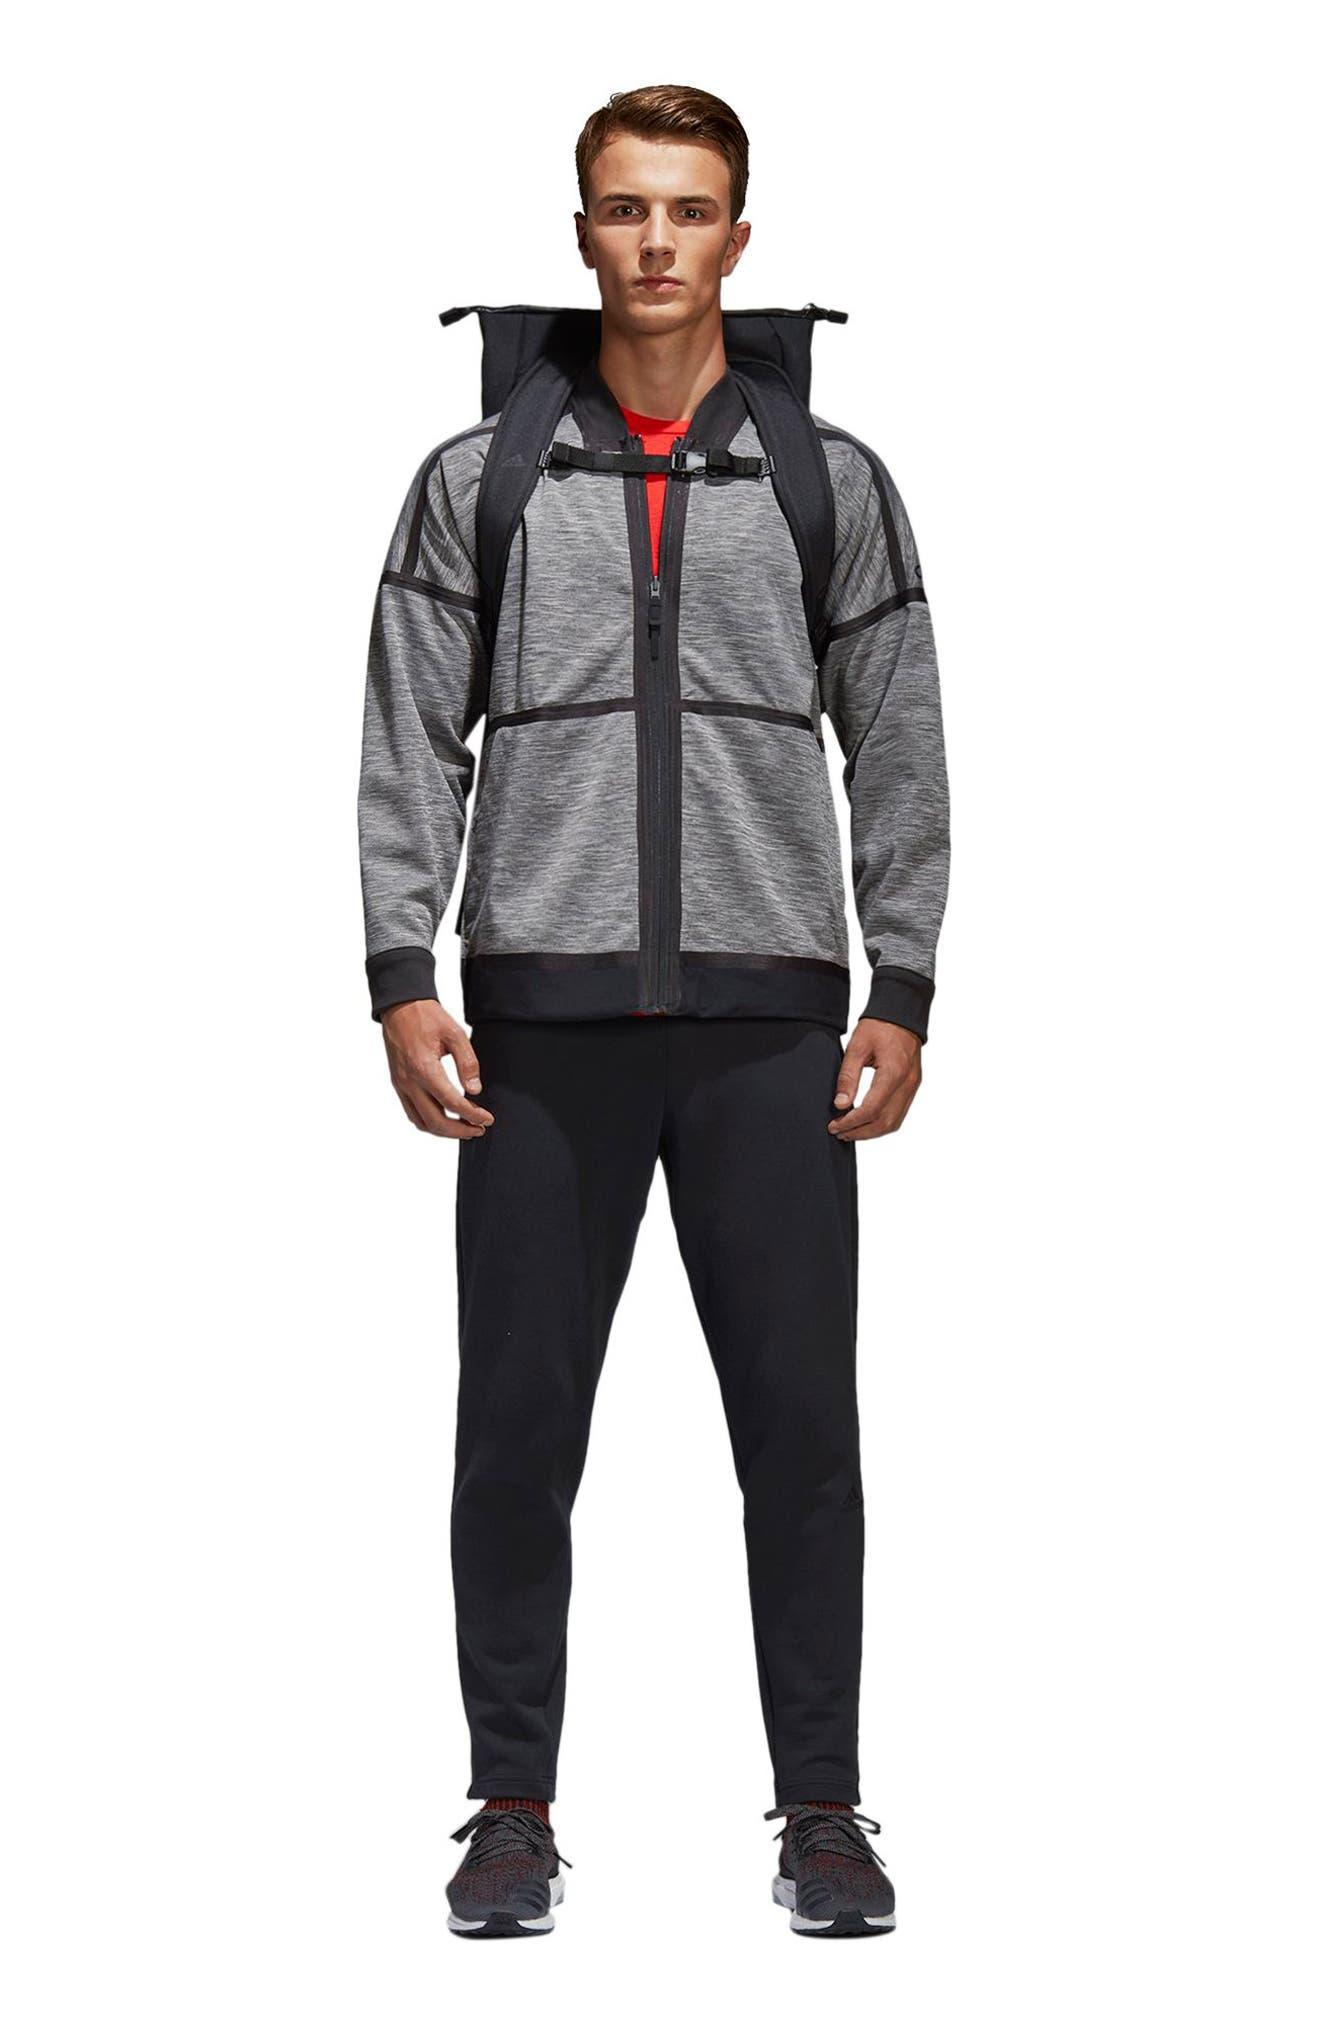 Z.N.E. Reversible Ventilated Jacket,                             Alternate thumbnail 2, color,                             Black / Storm Heather/ Mgh